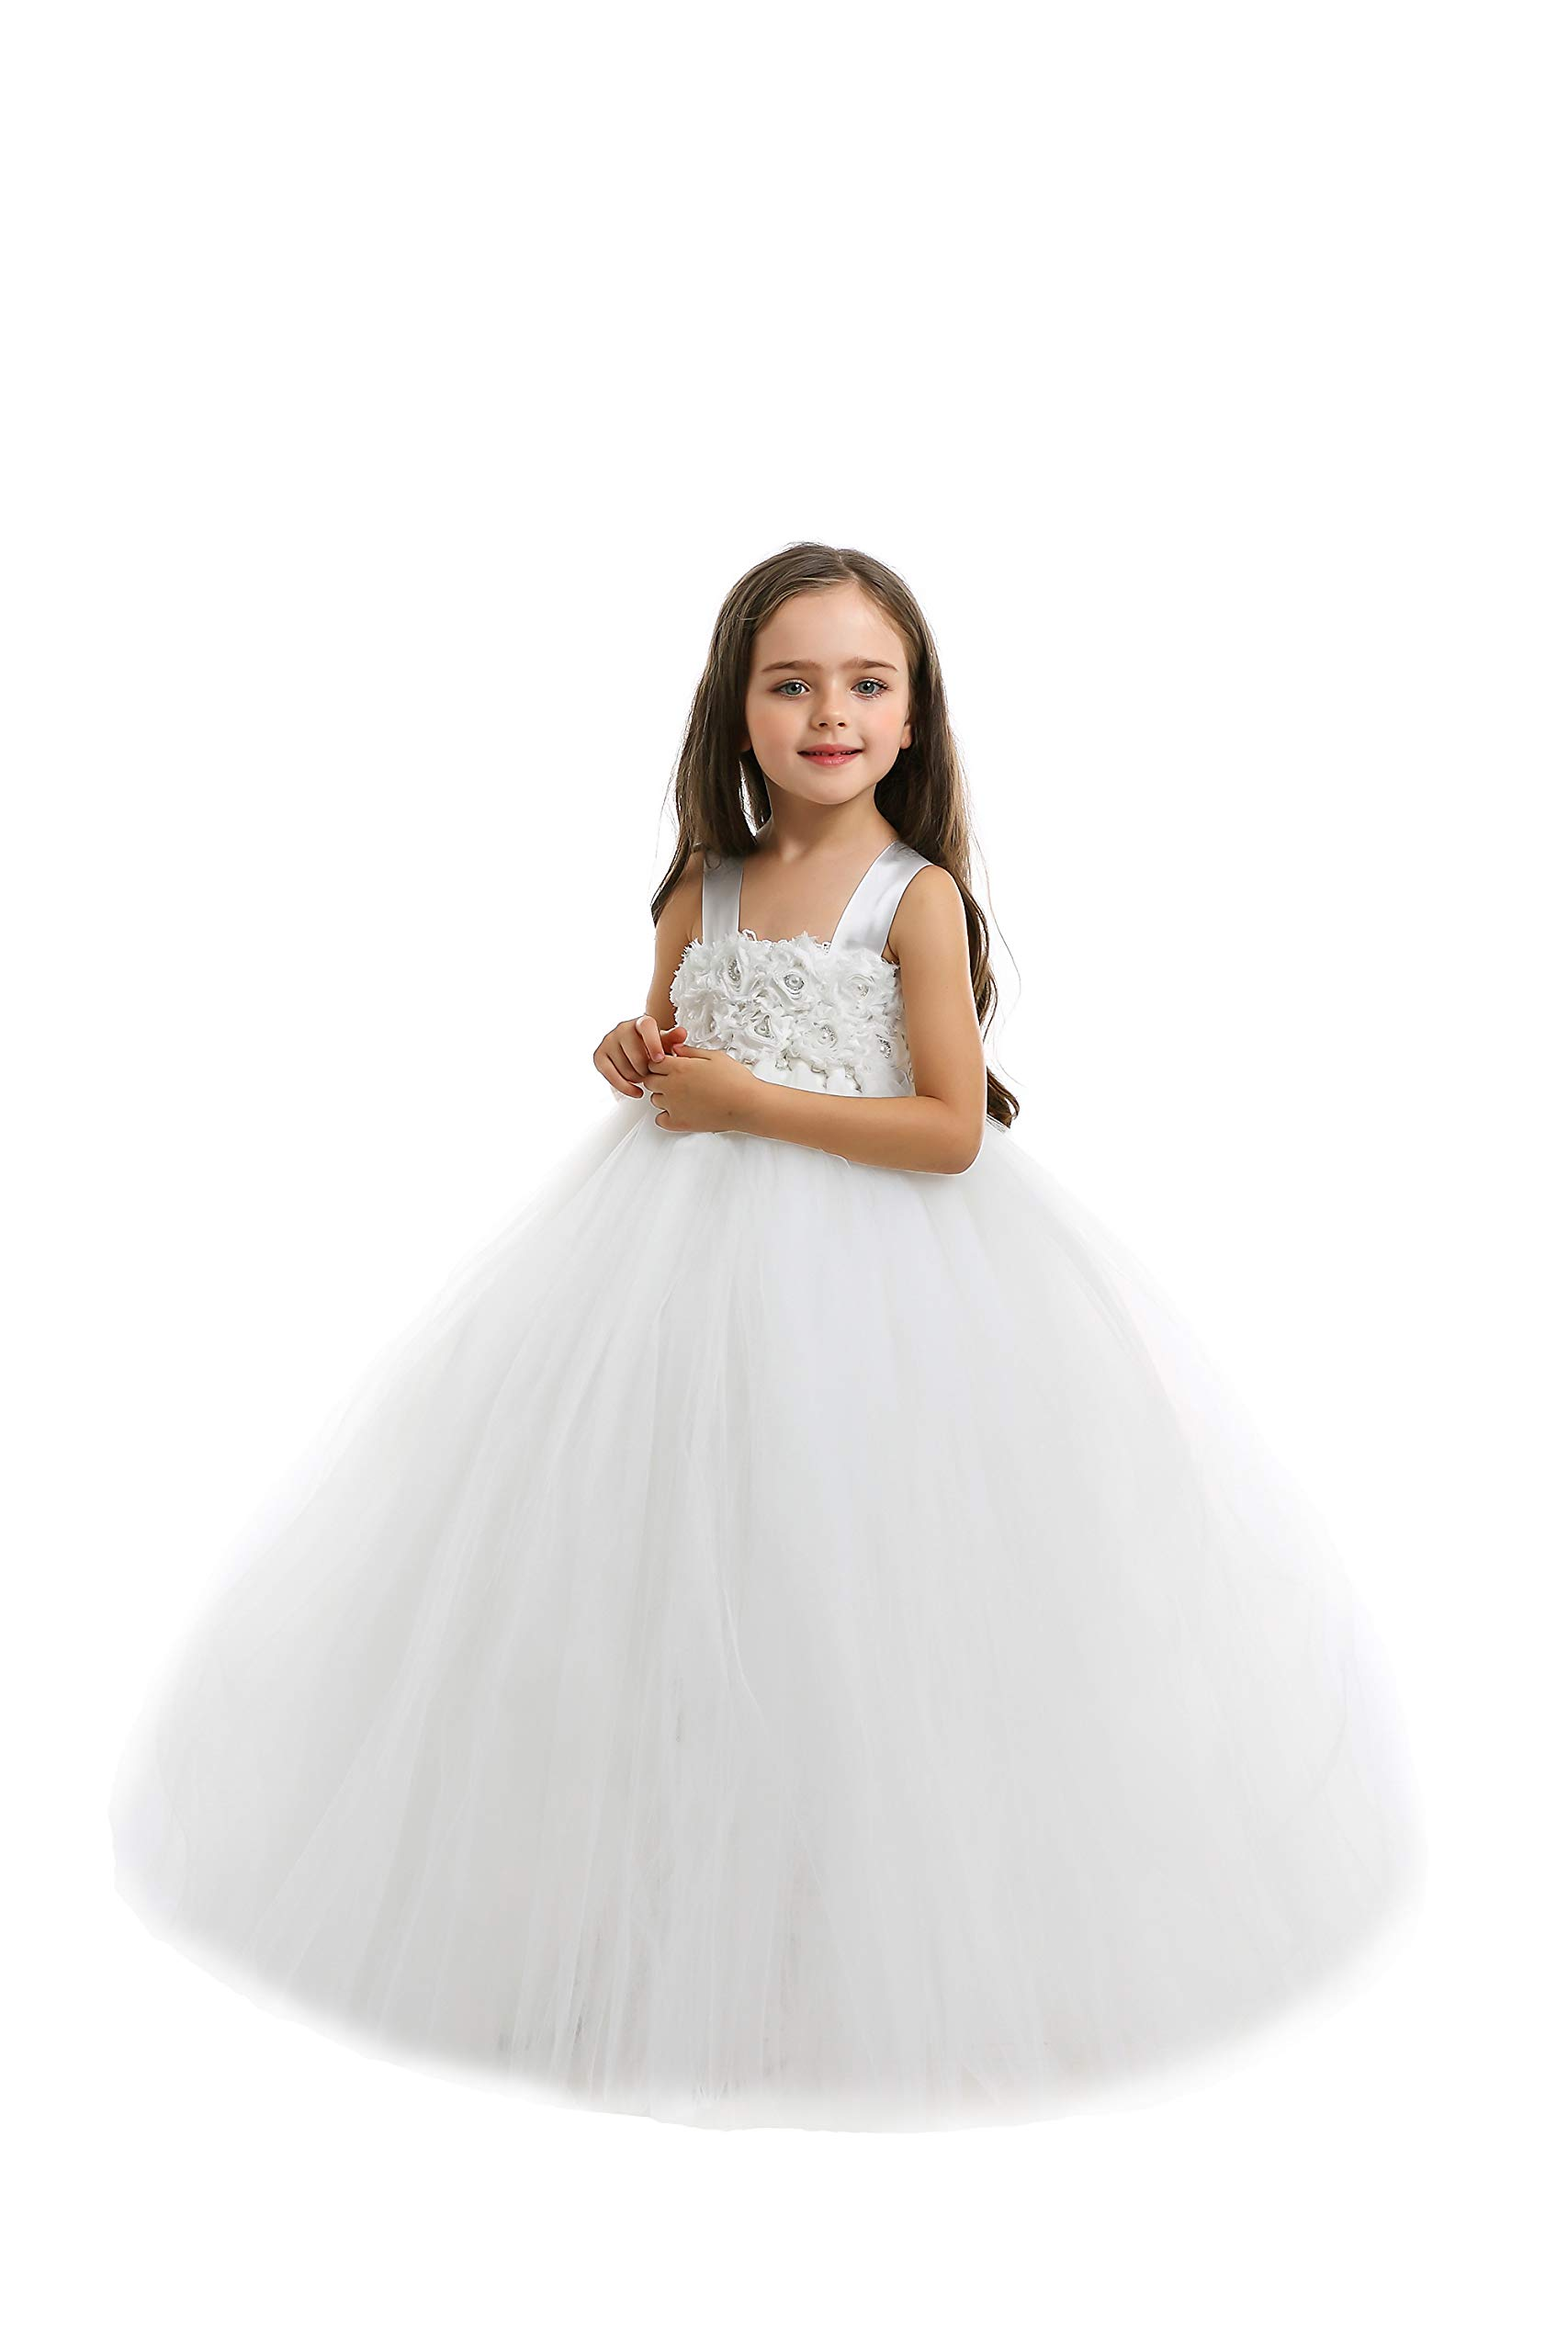 Ankle Length Ivory  Tutu Dress Flower Girl Dress with Lace Stretch Crochet Bodice